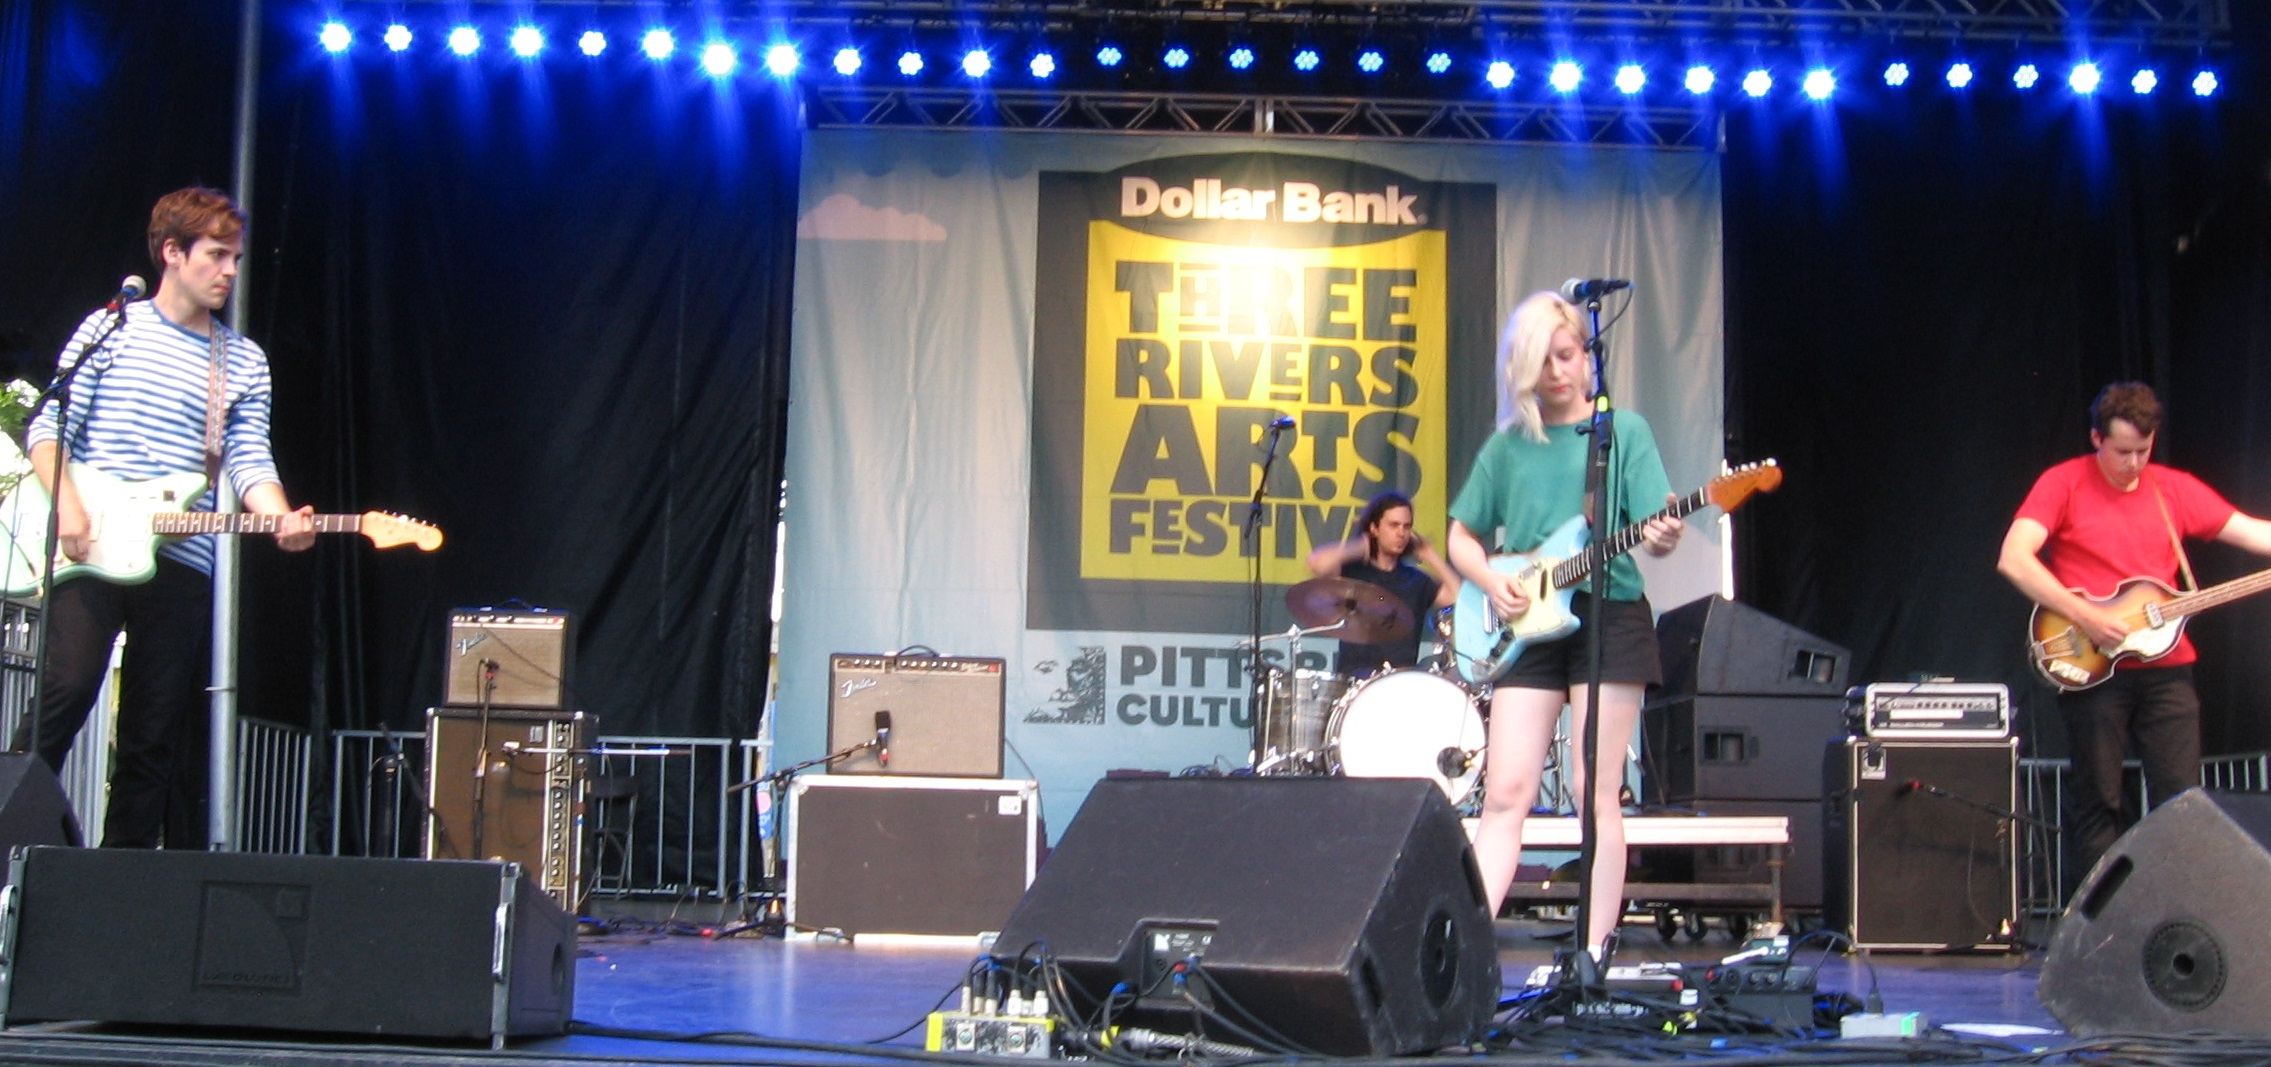 Alvvays in Concert at Three Rivers Arts Festival